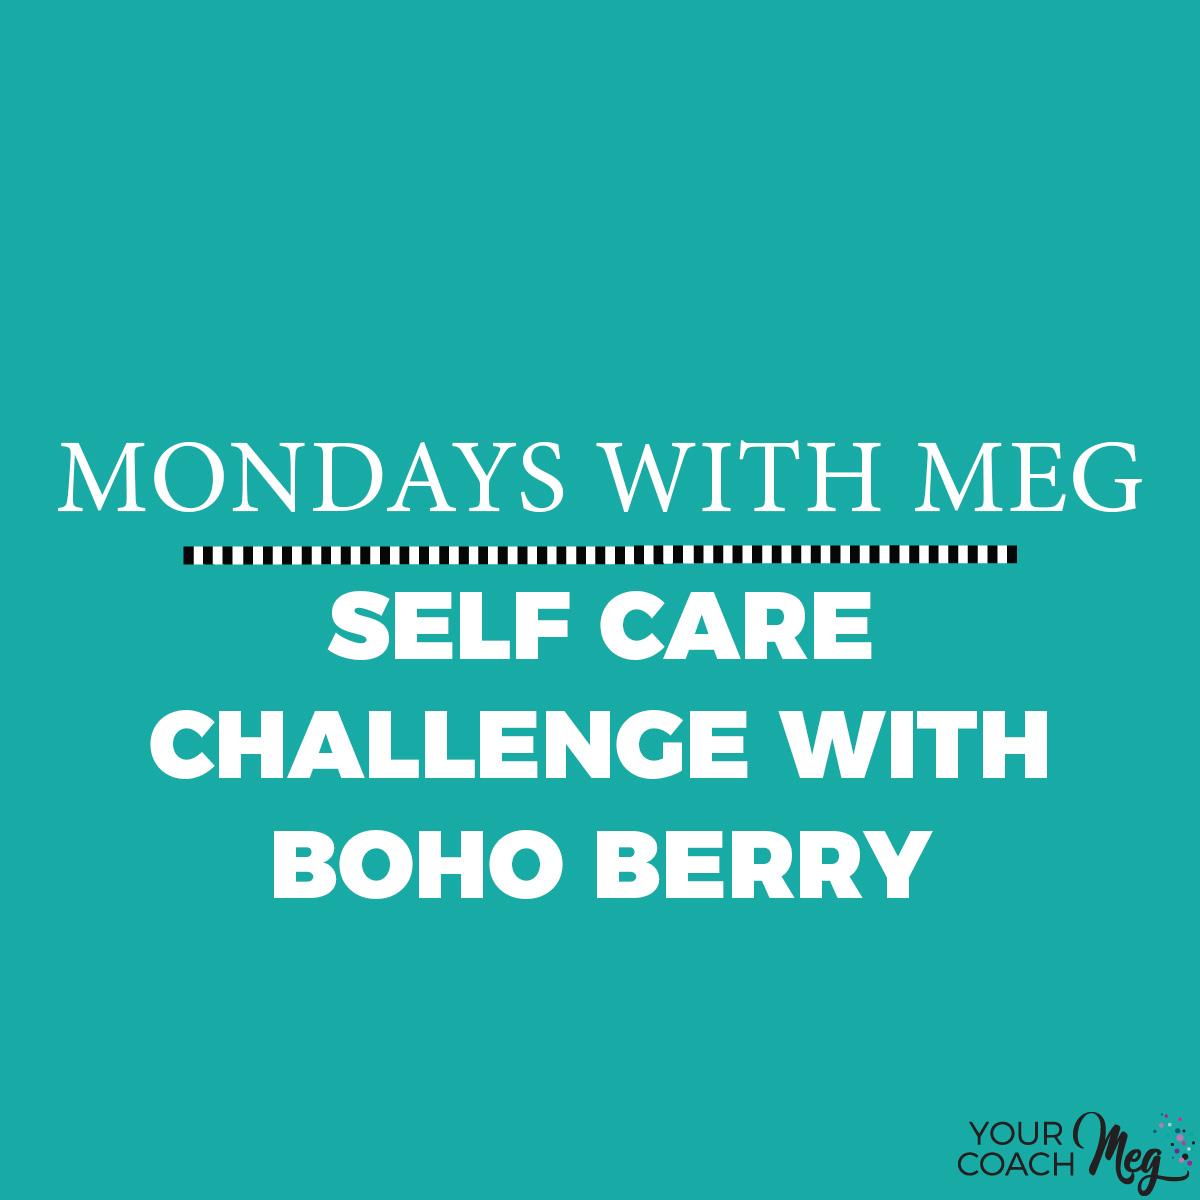 MONDAYS WITH MEG: BOHO BERRY SELF CARE CHALLENGE